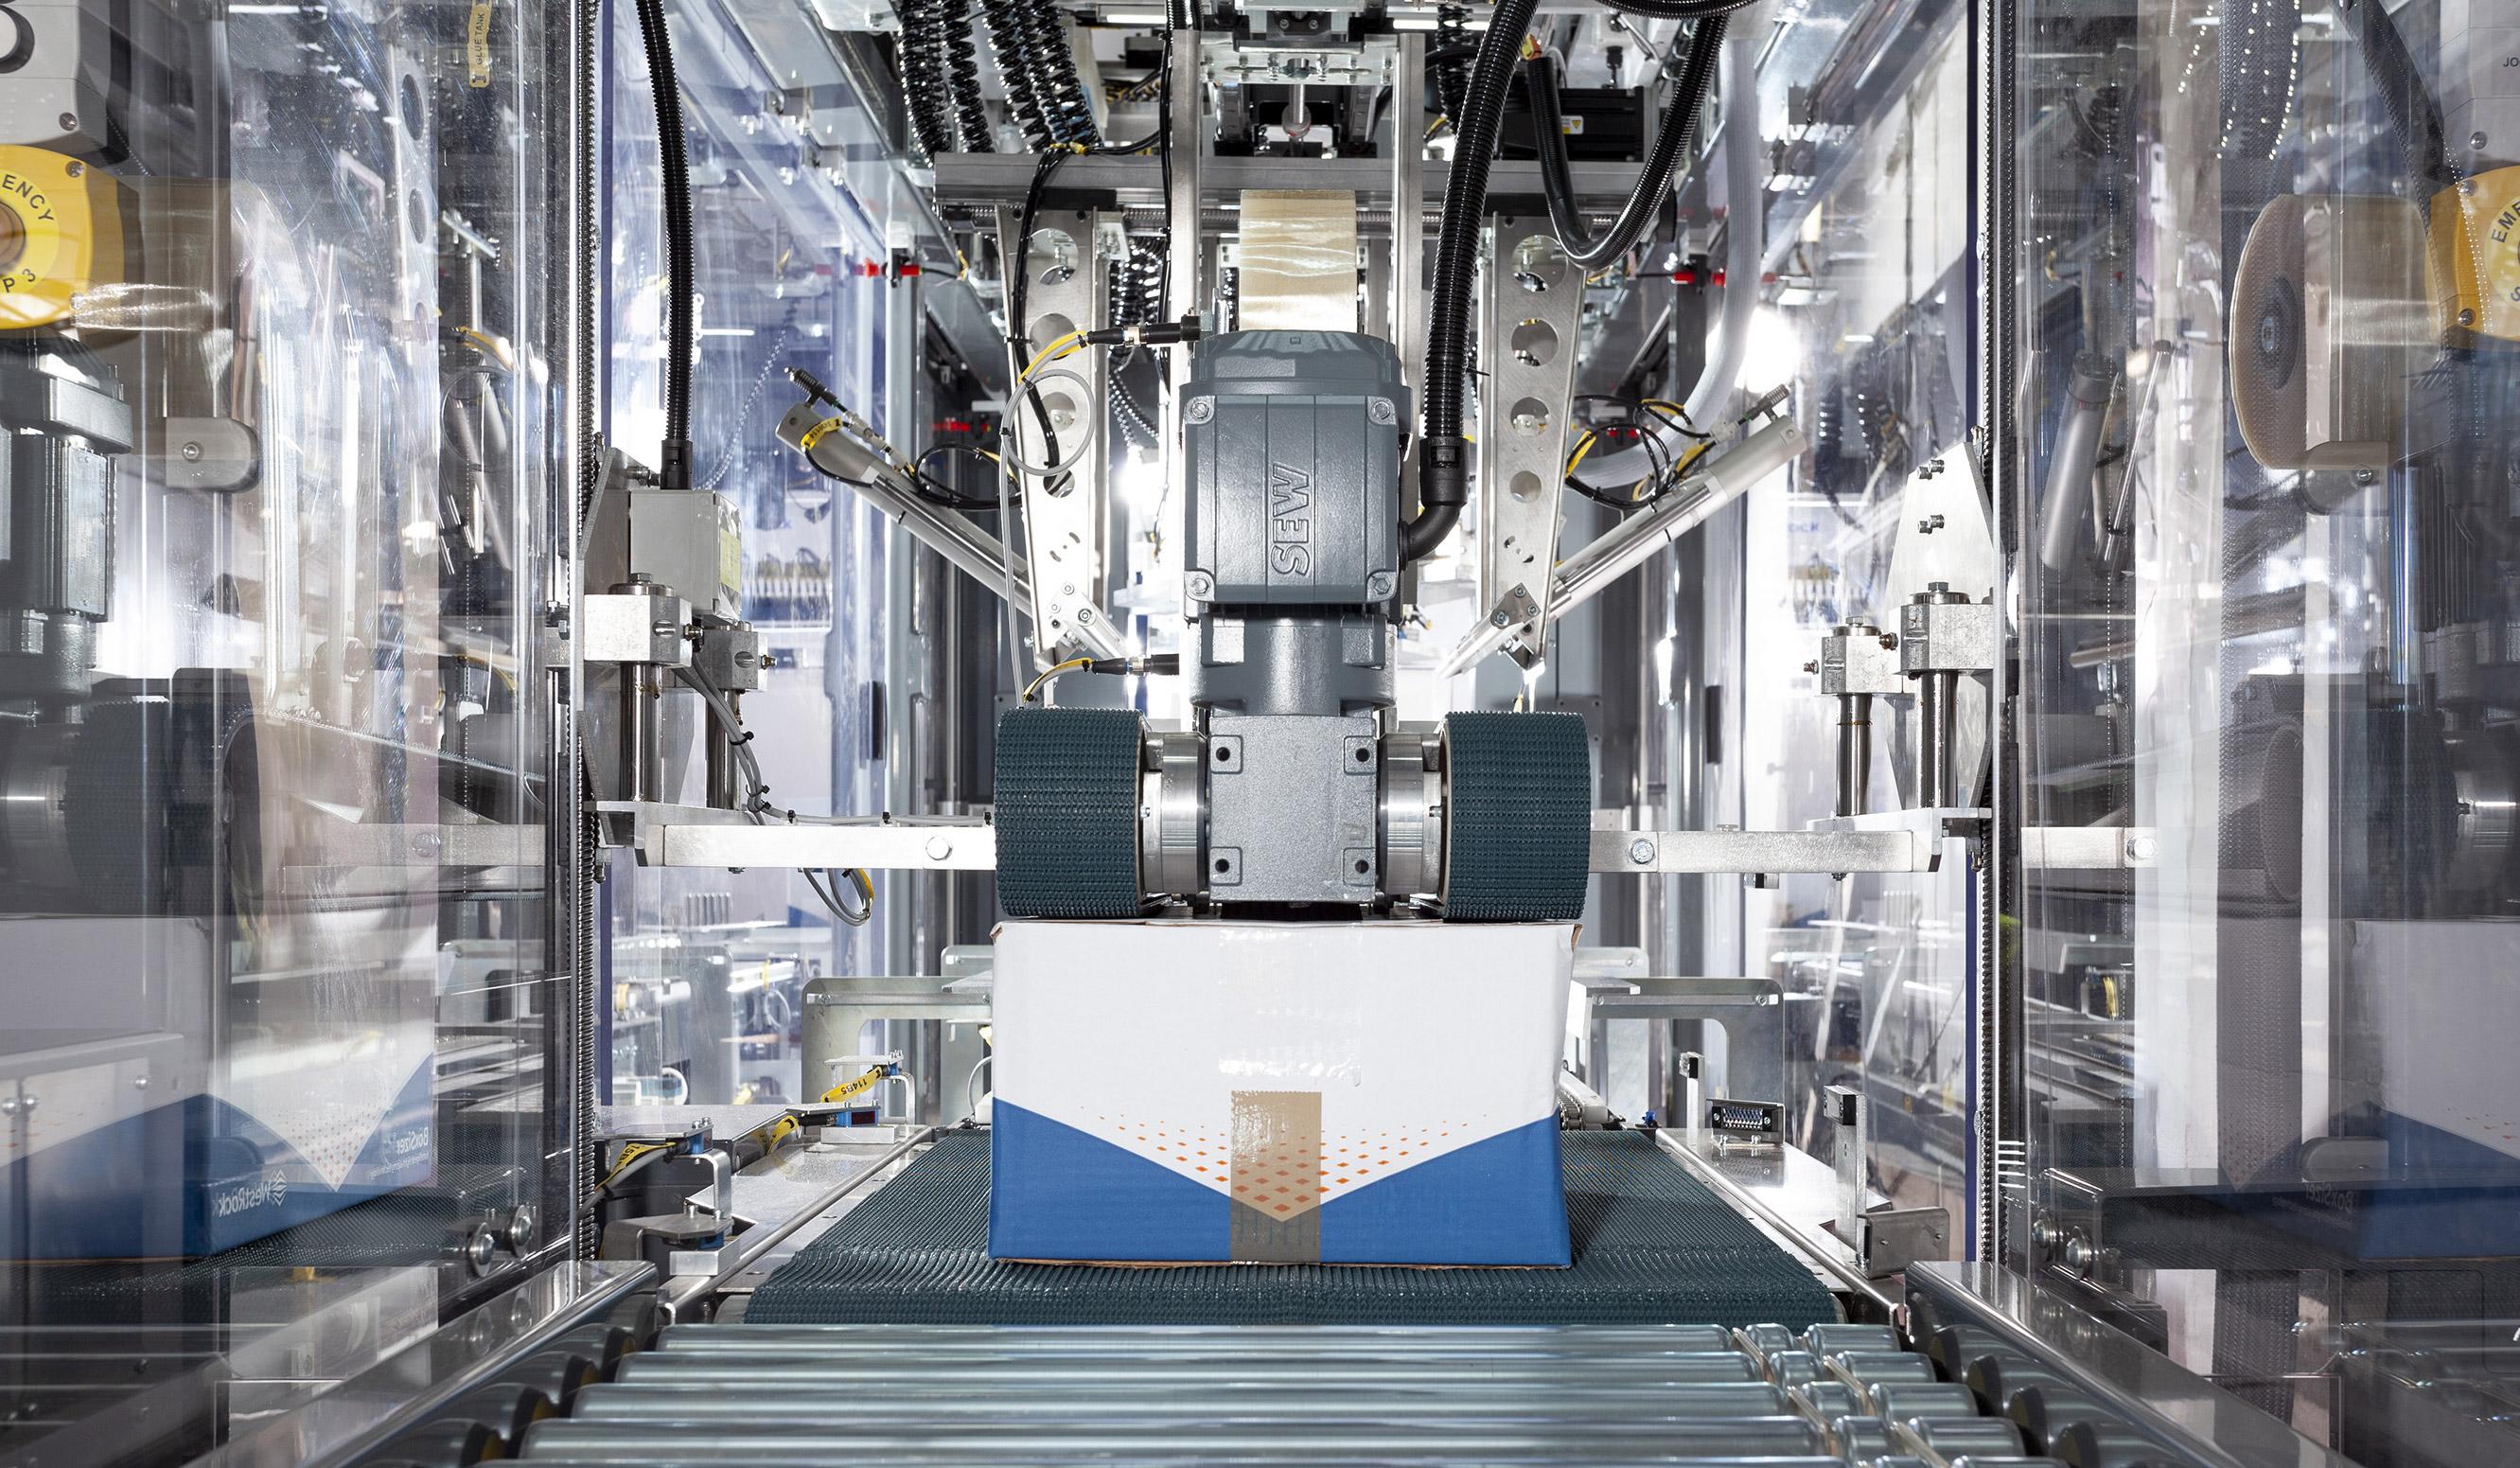 WestRock Boxsizer. Automated packaging machine preparing a cardboard box